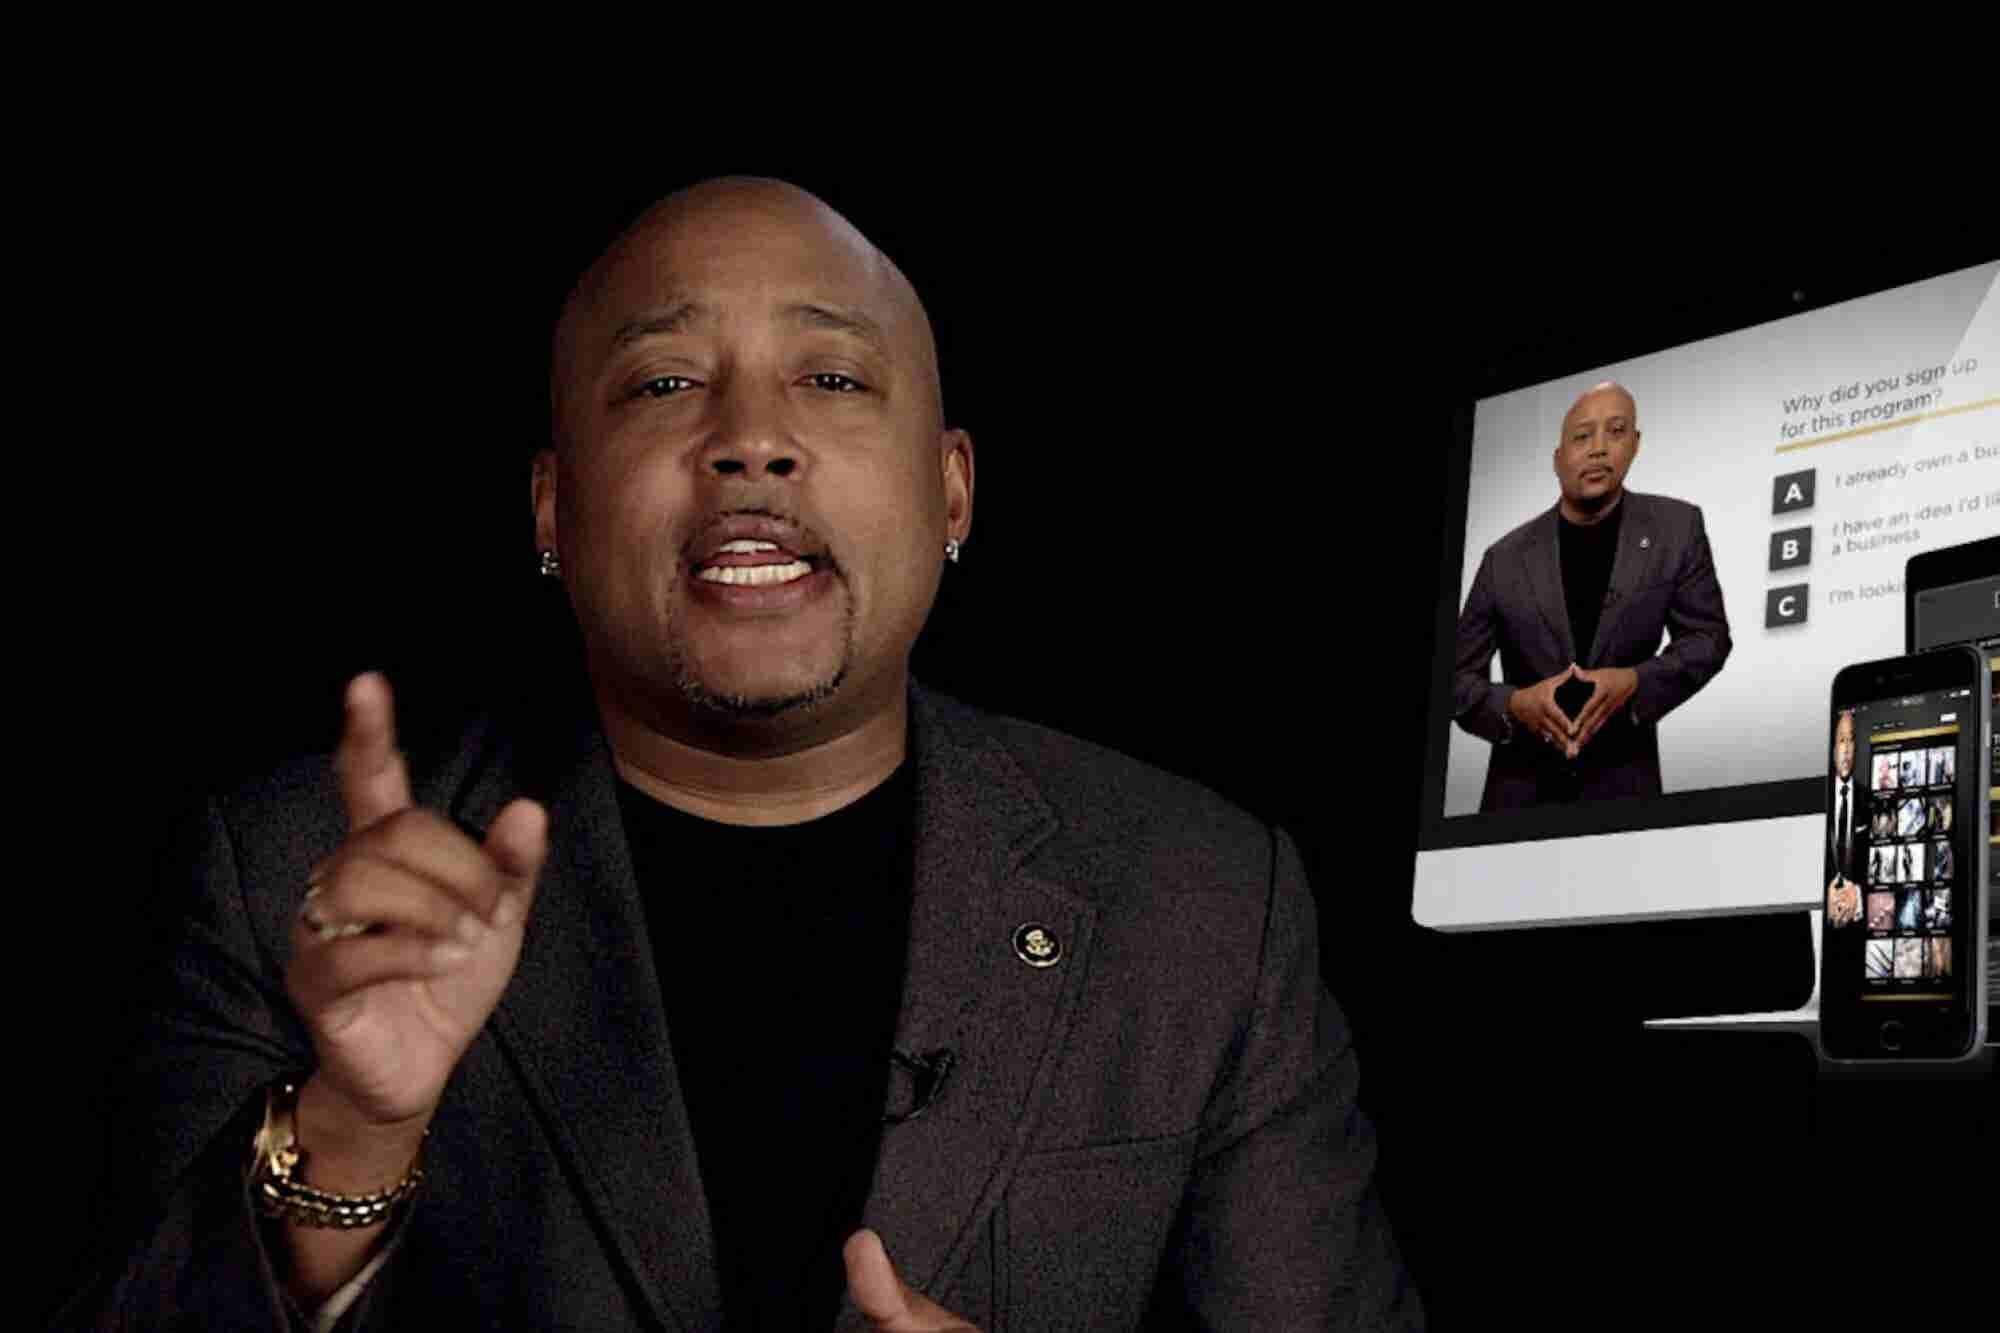 Daymond John Wants You to Smarten Up: 'Money Doesn't Solve Problems, I...